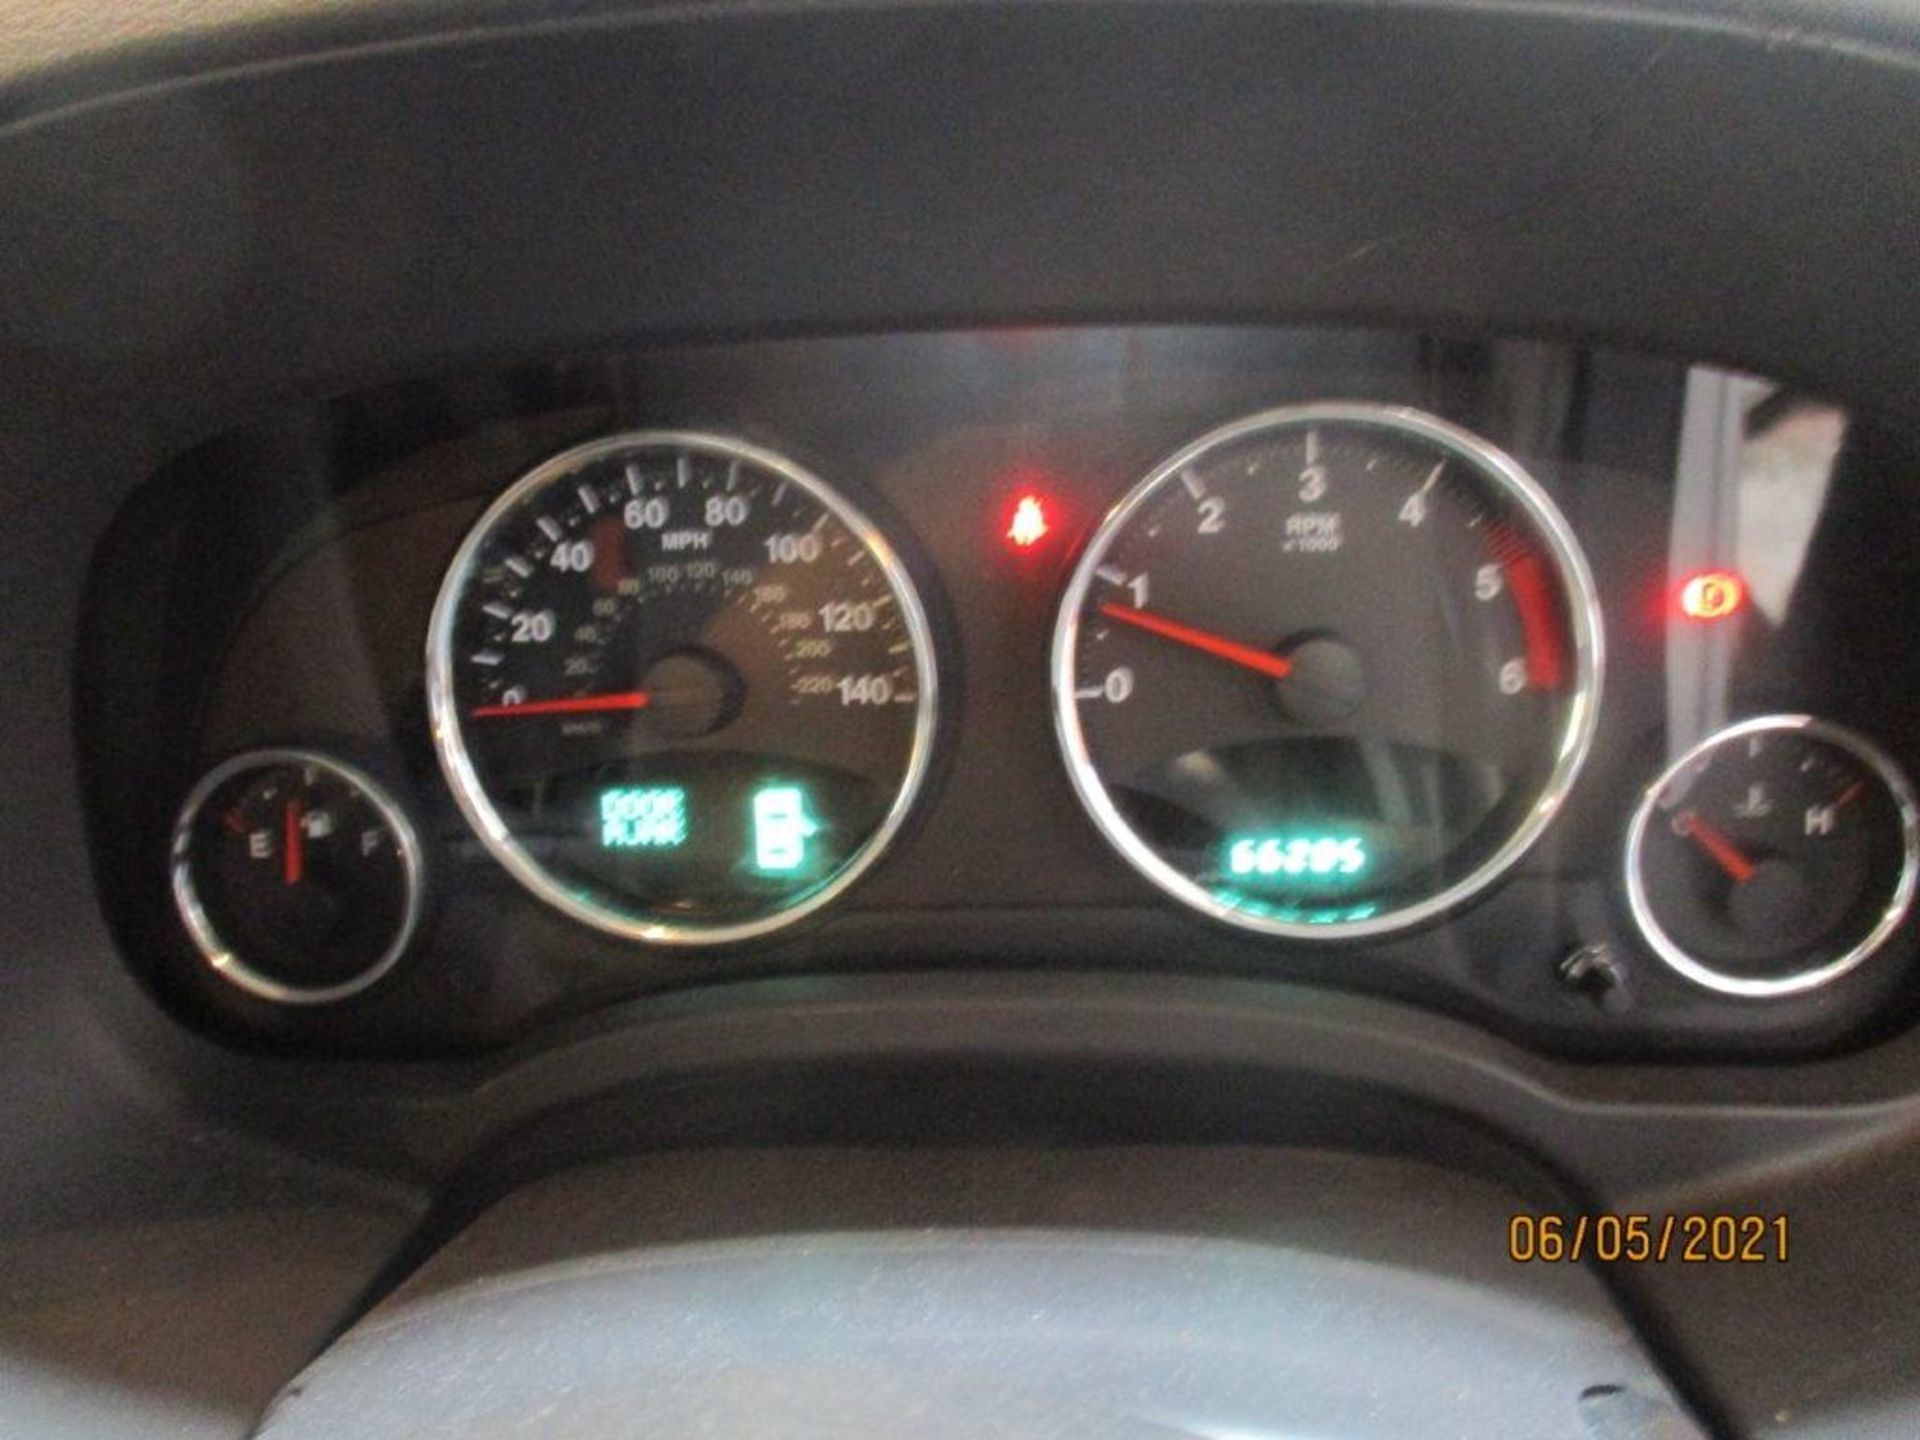 11 11 Jeep Patriot LTD CRD - Image 9 of 16